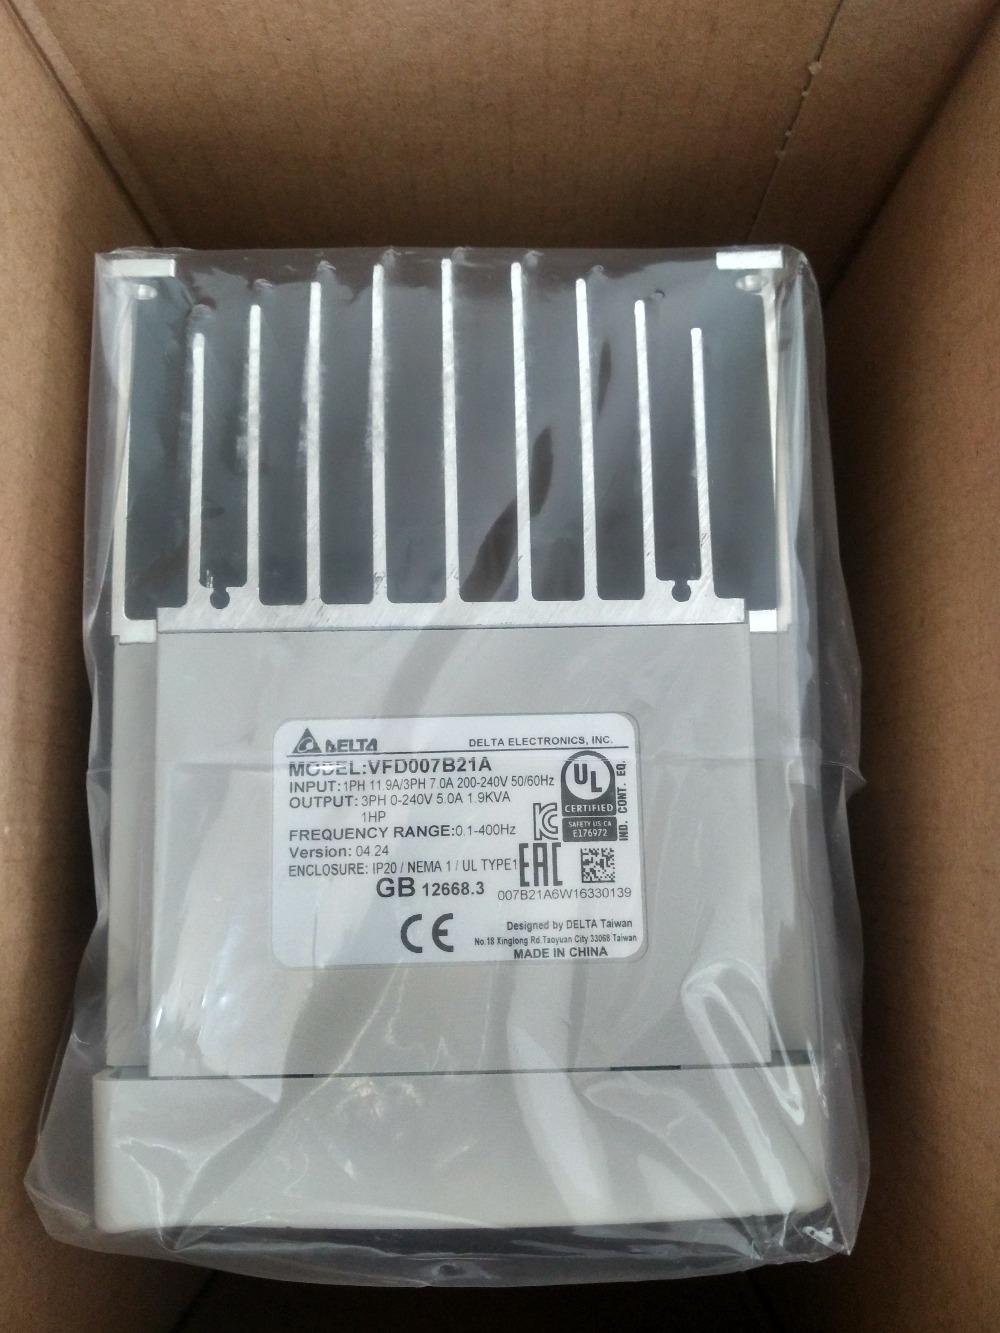 DELTA VFD007B21A VFD-B Inverter Frequency Converter 750w 1HP 1 PHASE 220V 400HZ